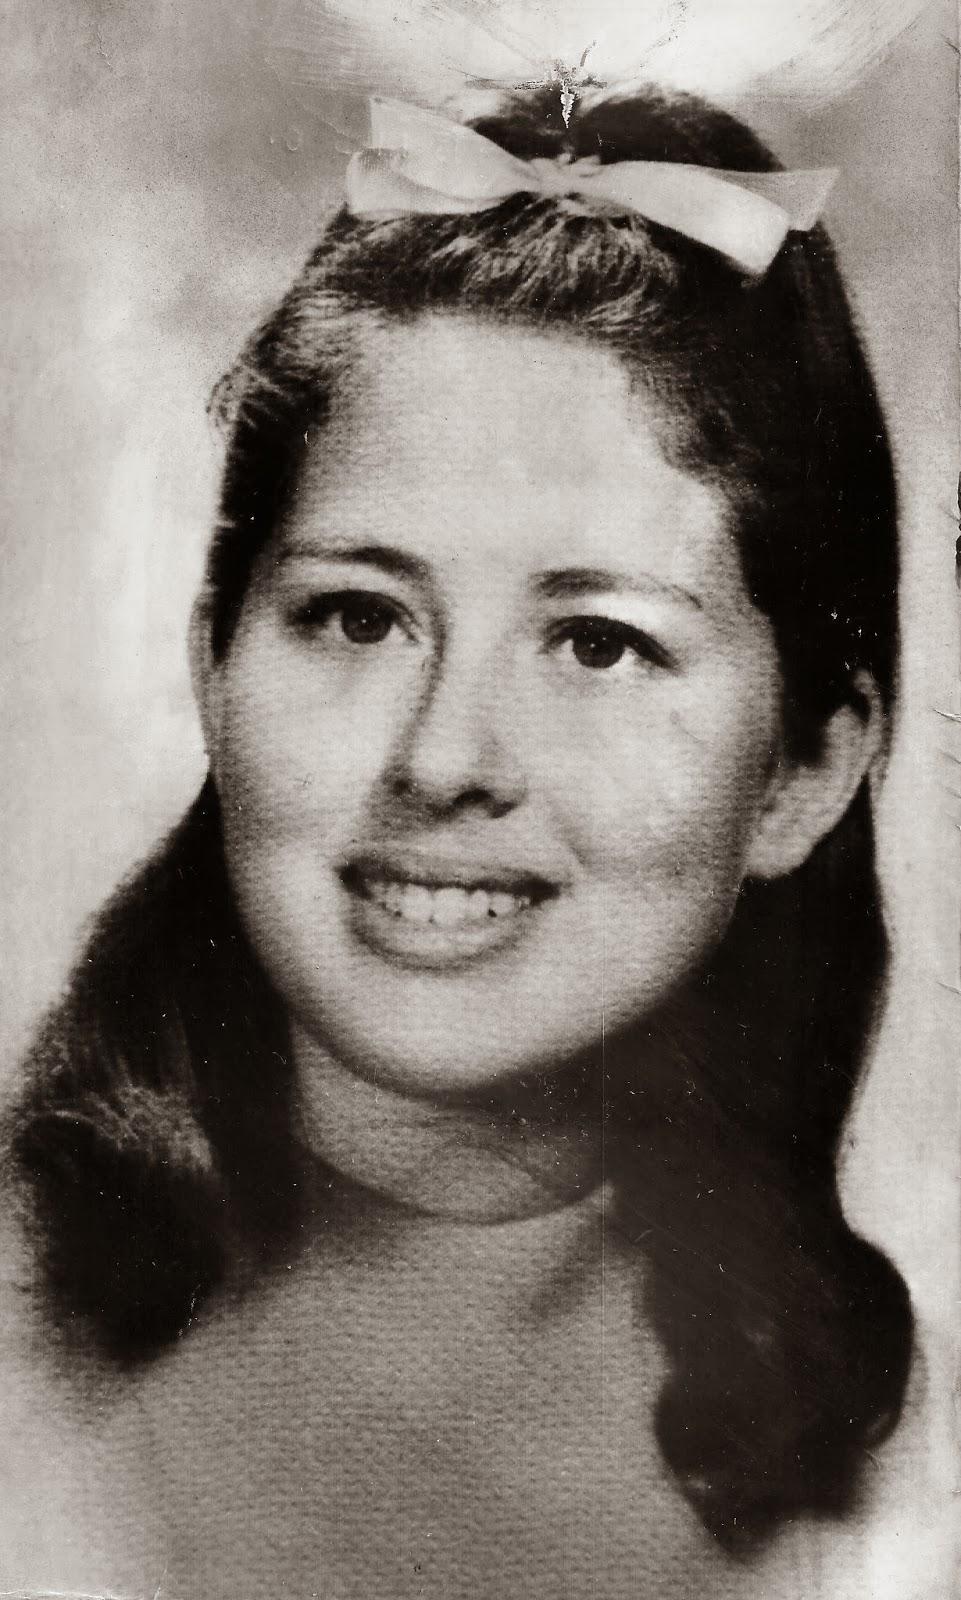 Fornology Alice Kalom S 1969 Ann Arbor Murder Haunts